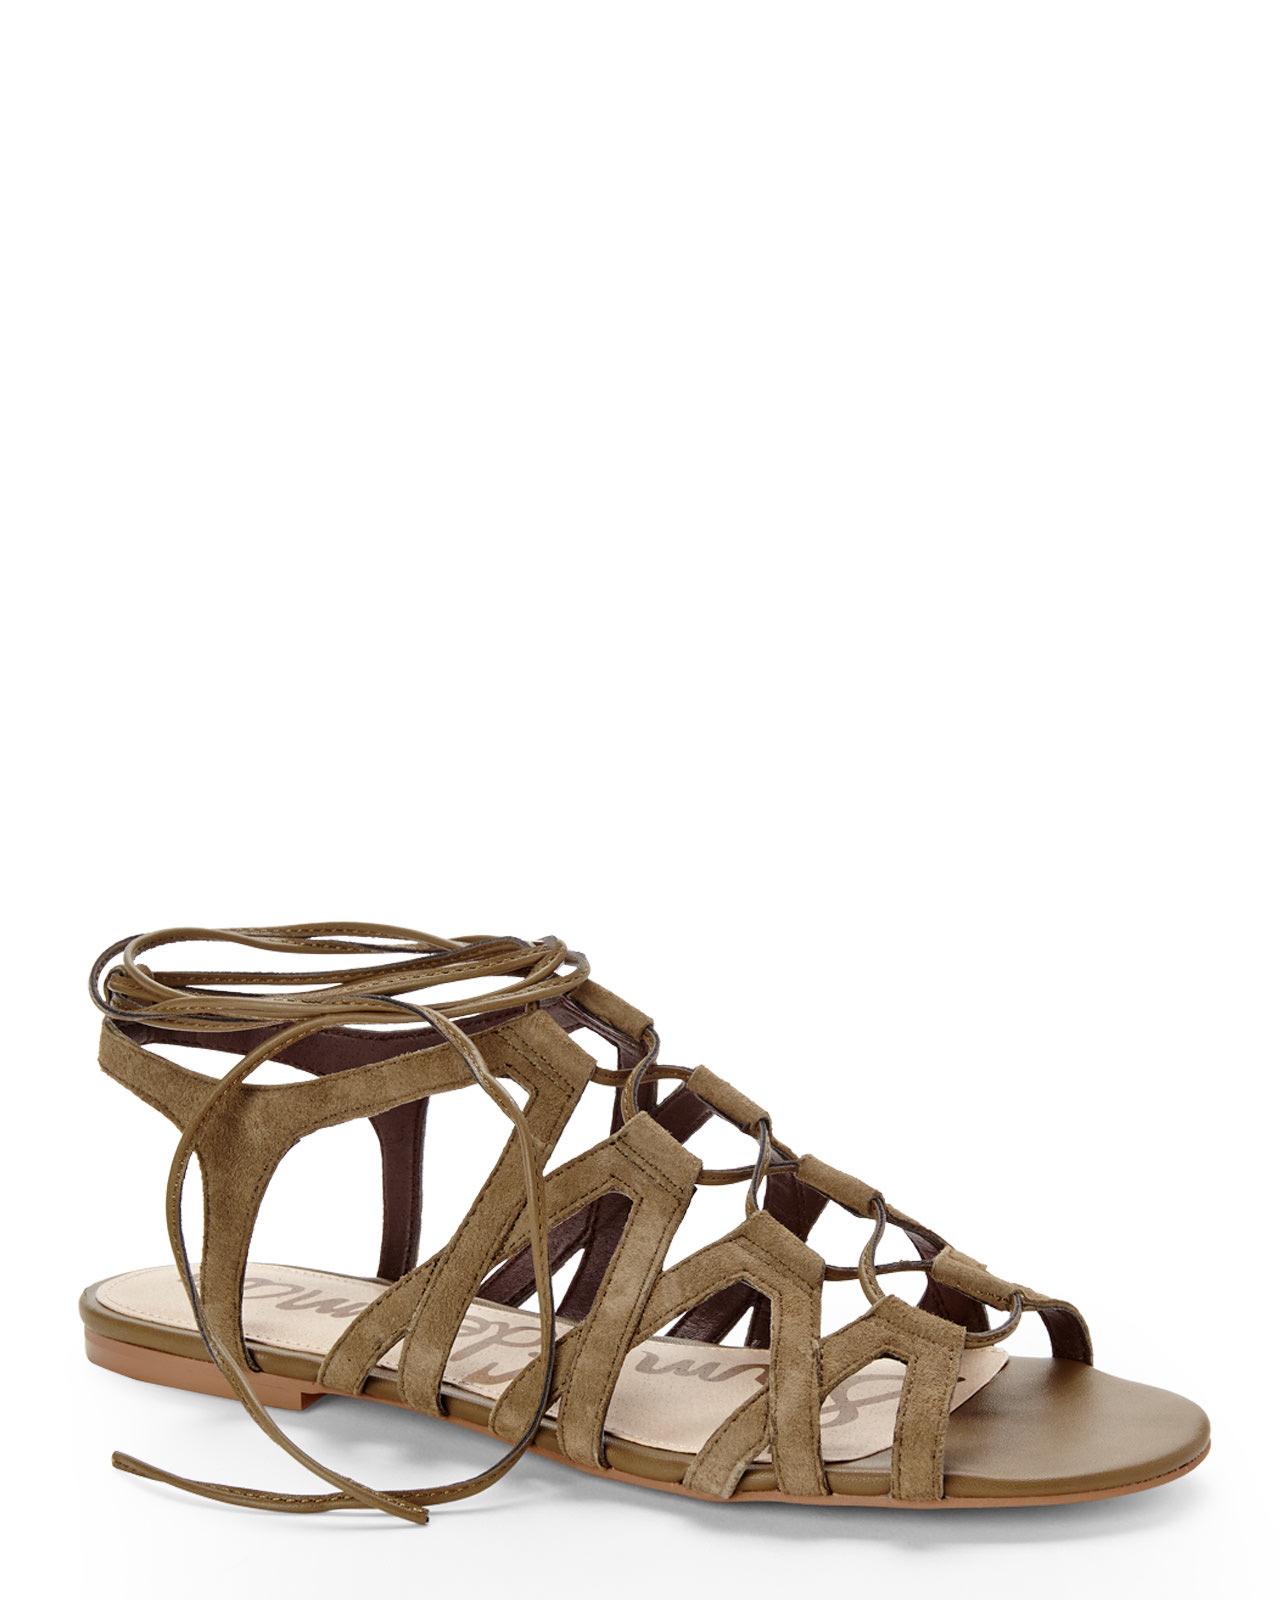 49faaa1c93ba Lyst - Sam Edelman Green Boyden Gladiator Sandals in Green